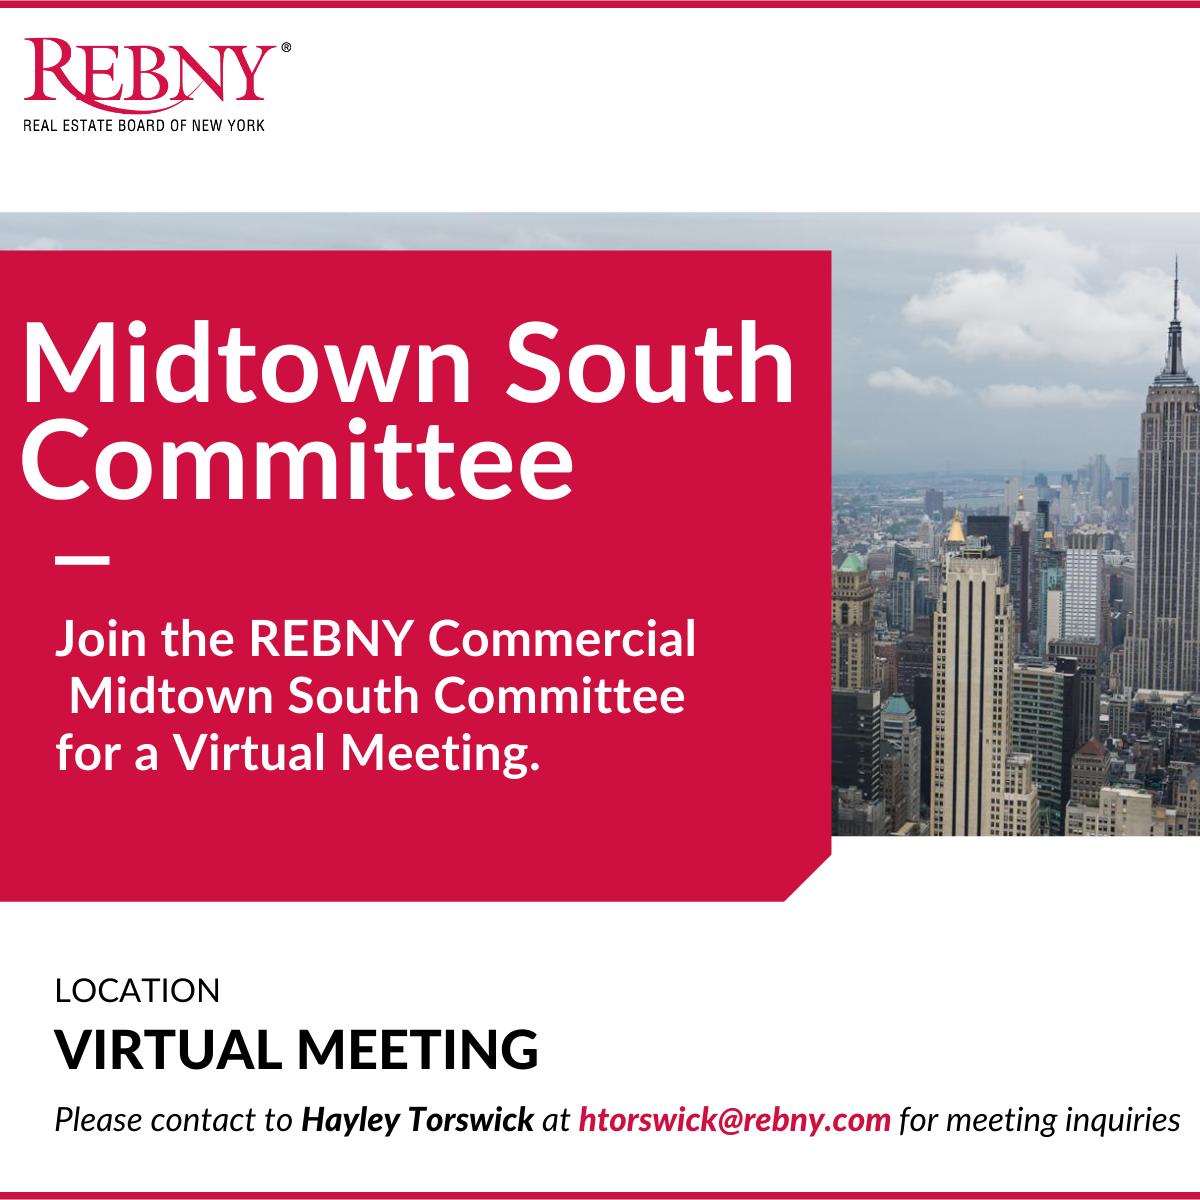 VIRTUAL: Commercial Brokerage Midtown South Committee Meeting